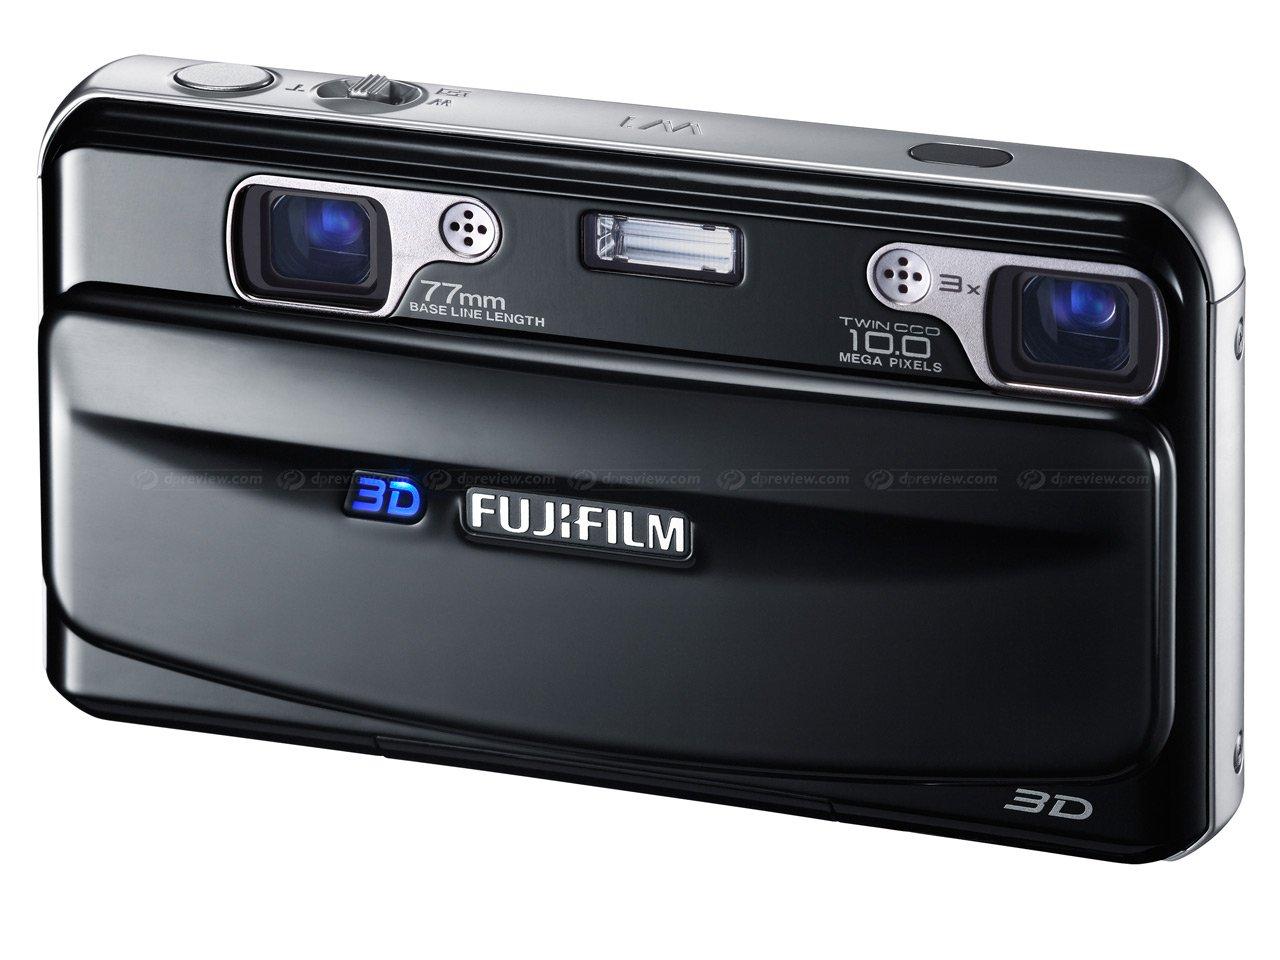 Fujifilm FinePix Real 3D W1 Camera - Black 3D/2D LCD: Amazon.co.uk ...